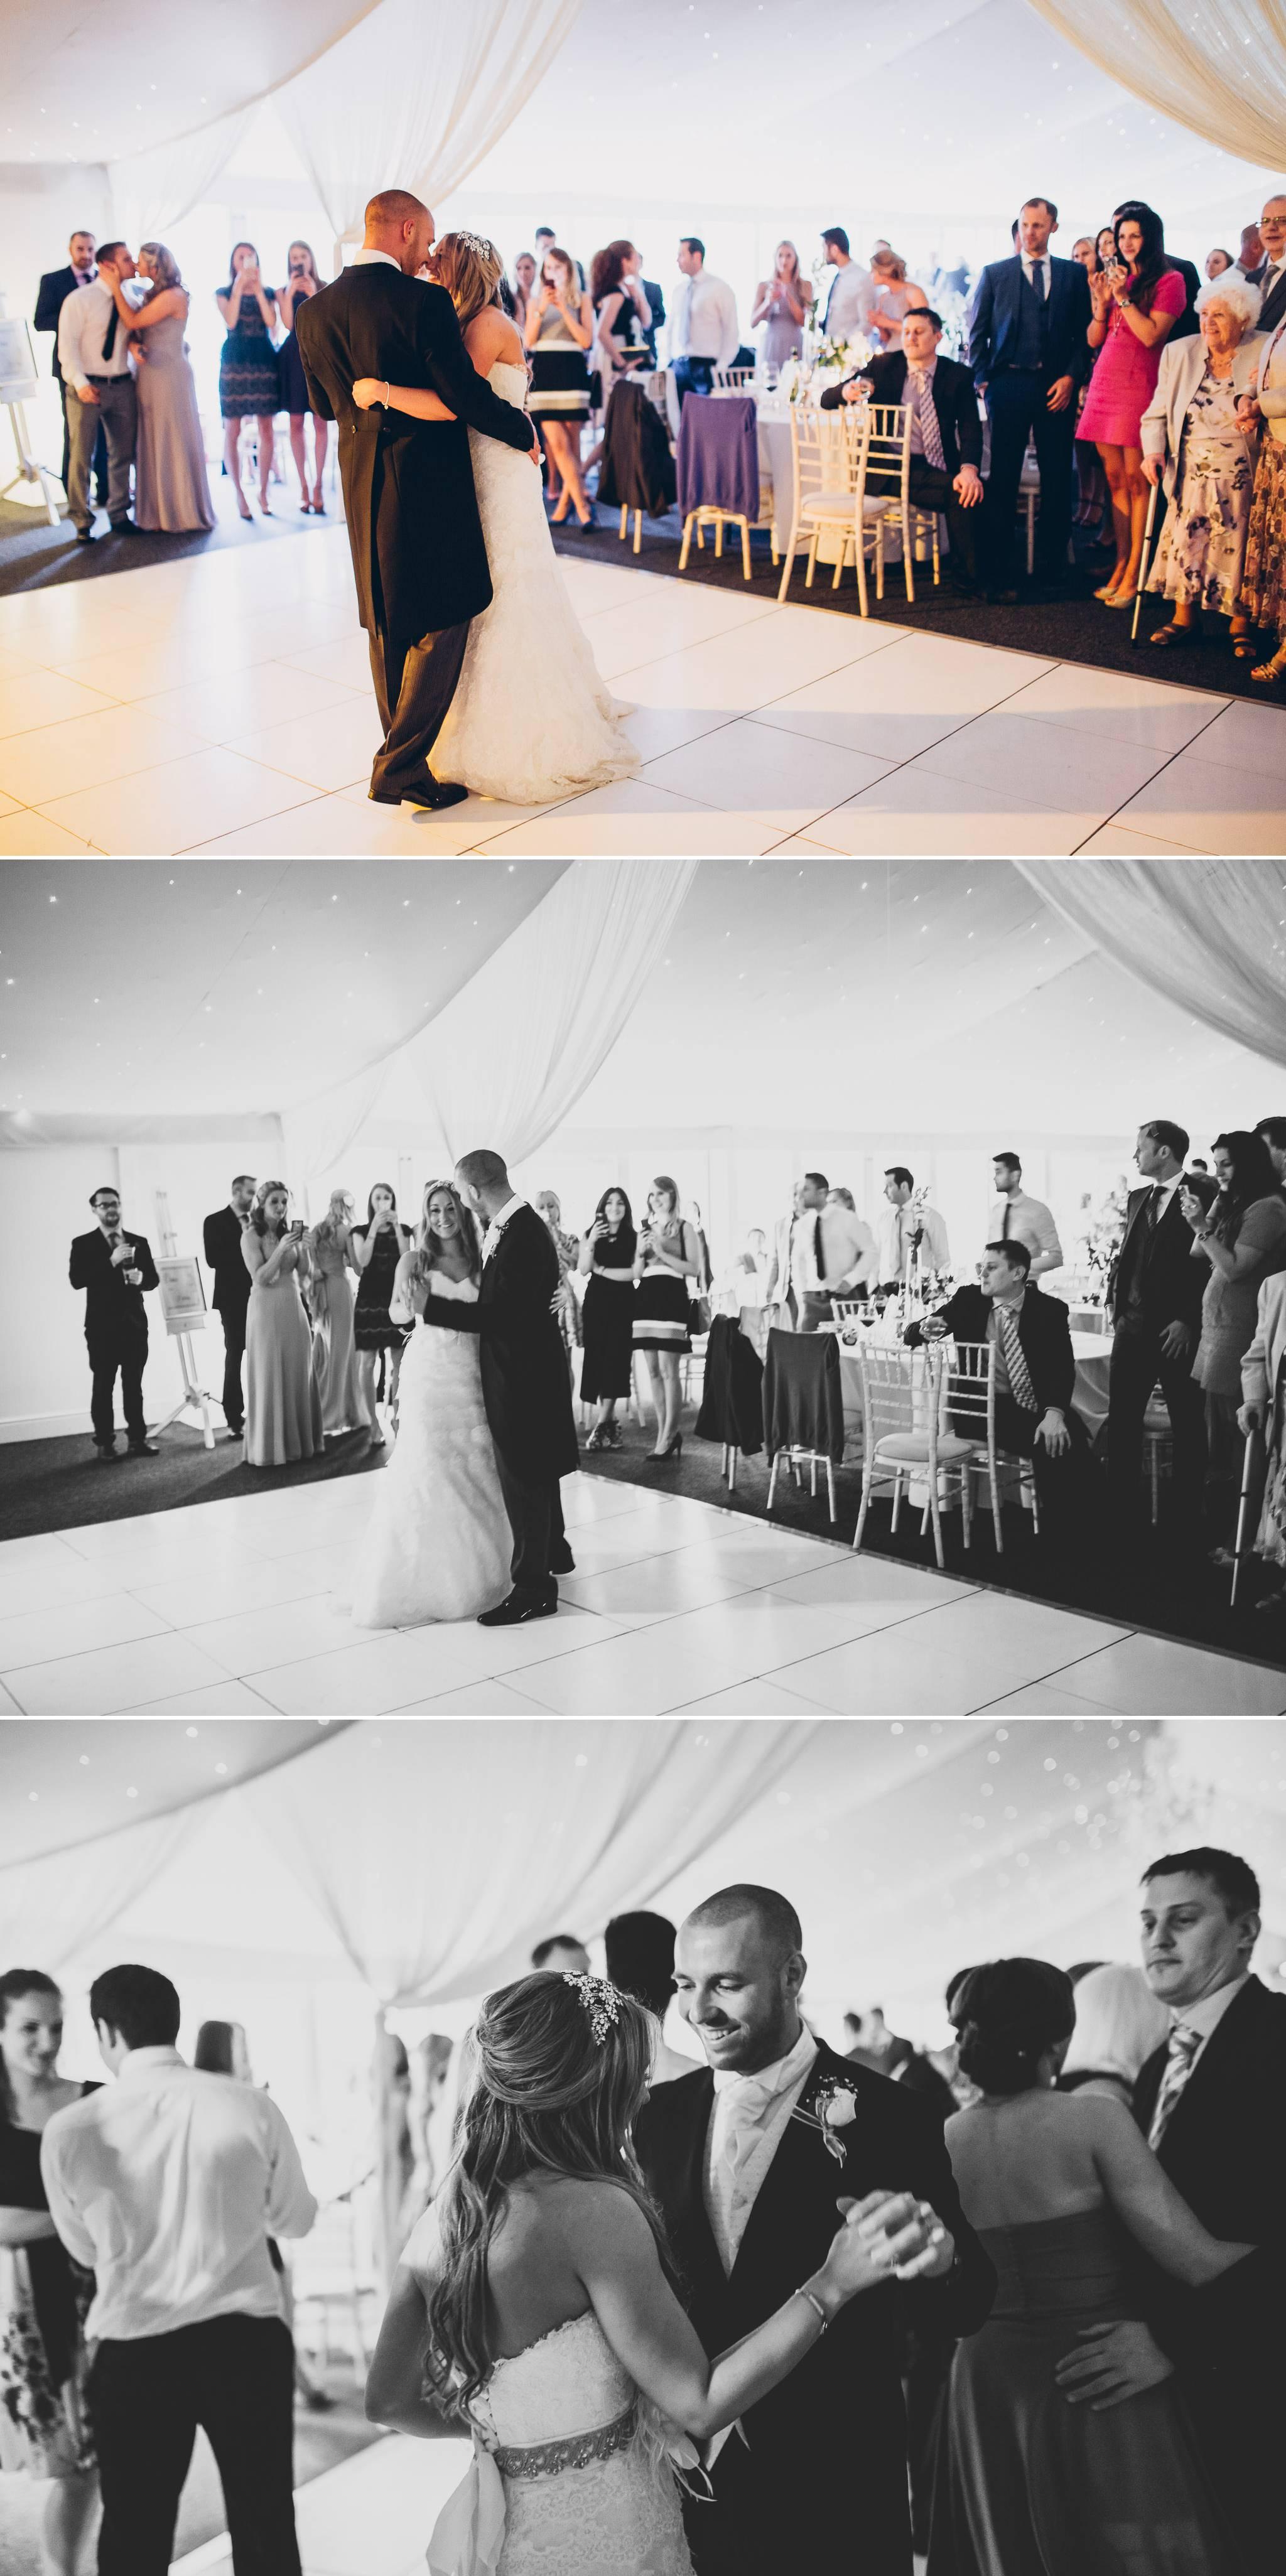 shropshire-wedding-photography 36.jpg